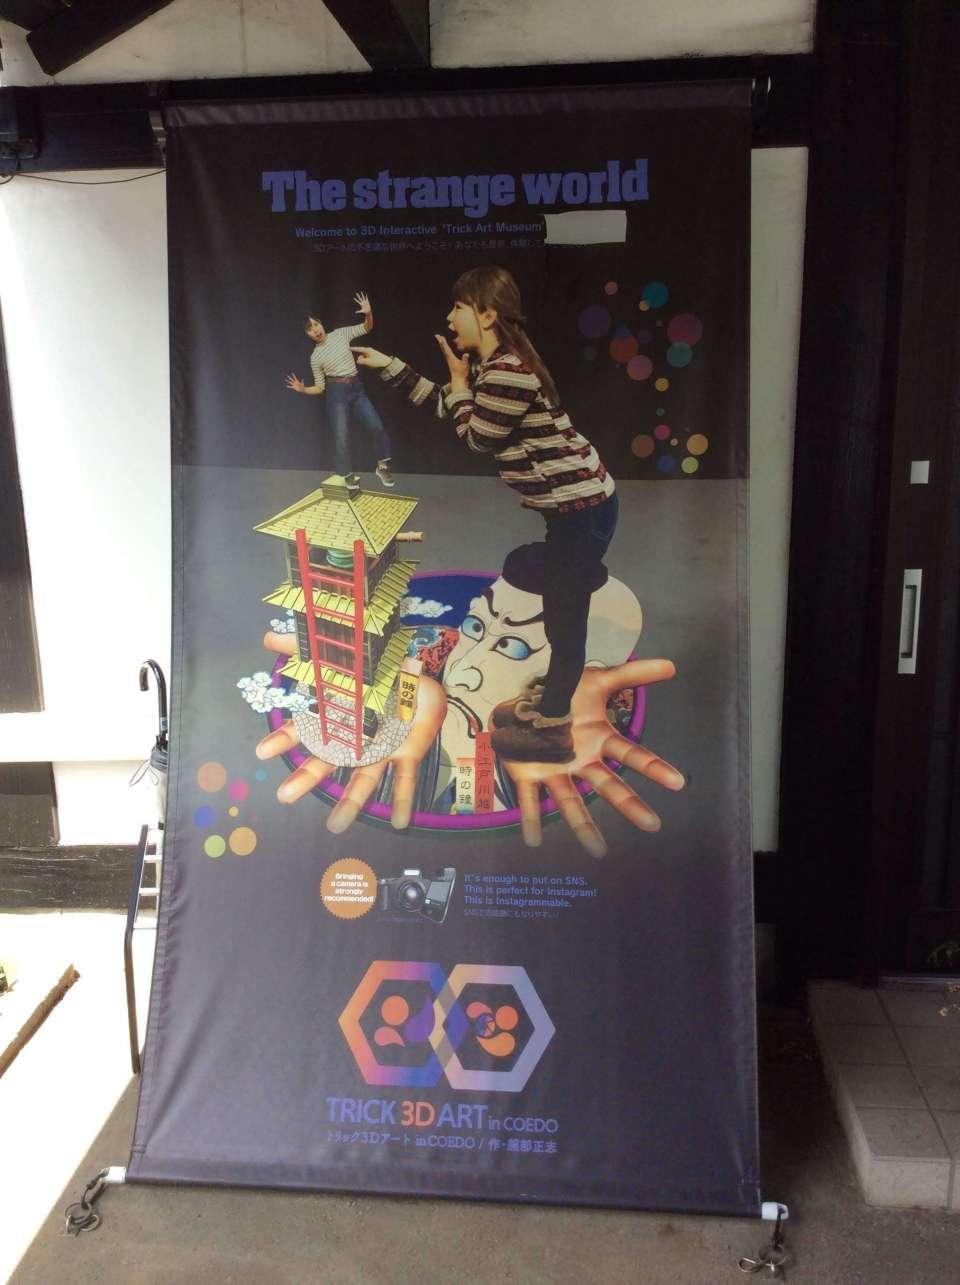 The Strange World 3d trick art in coedo